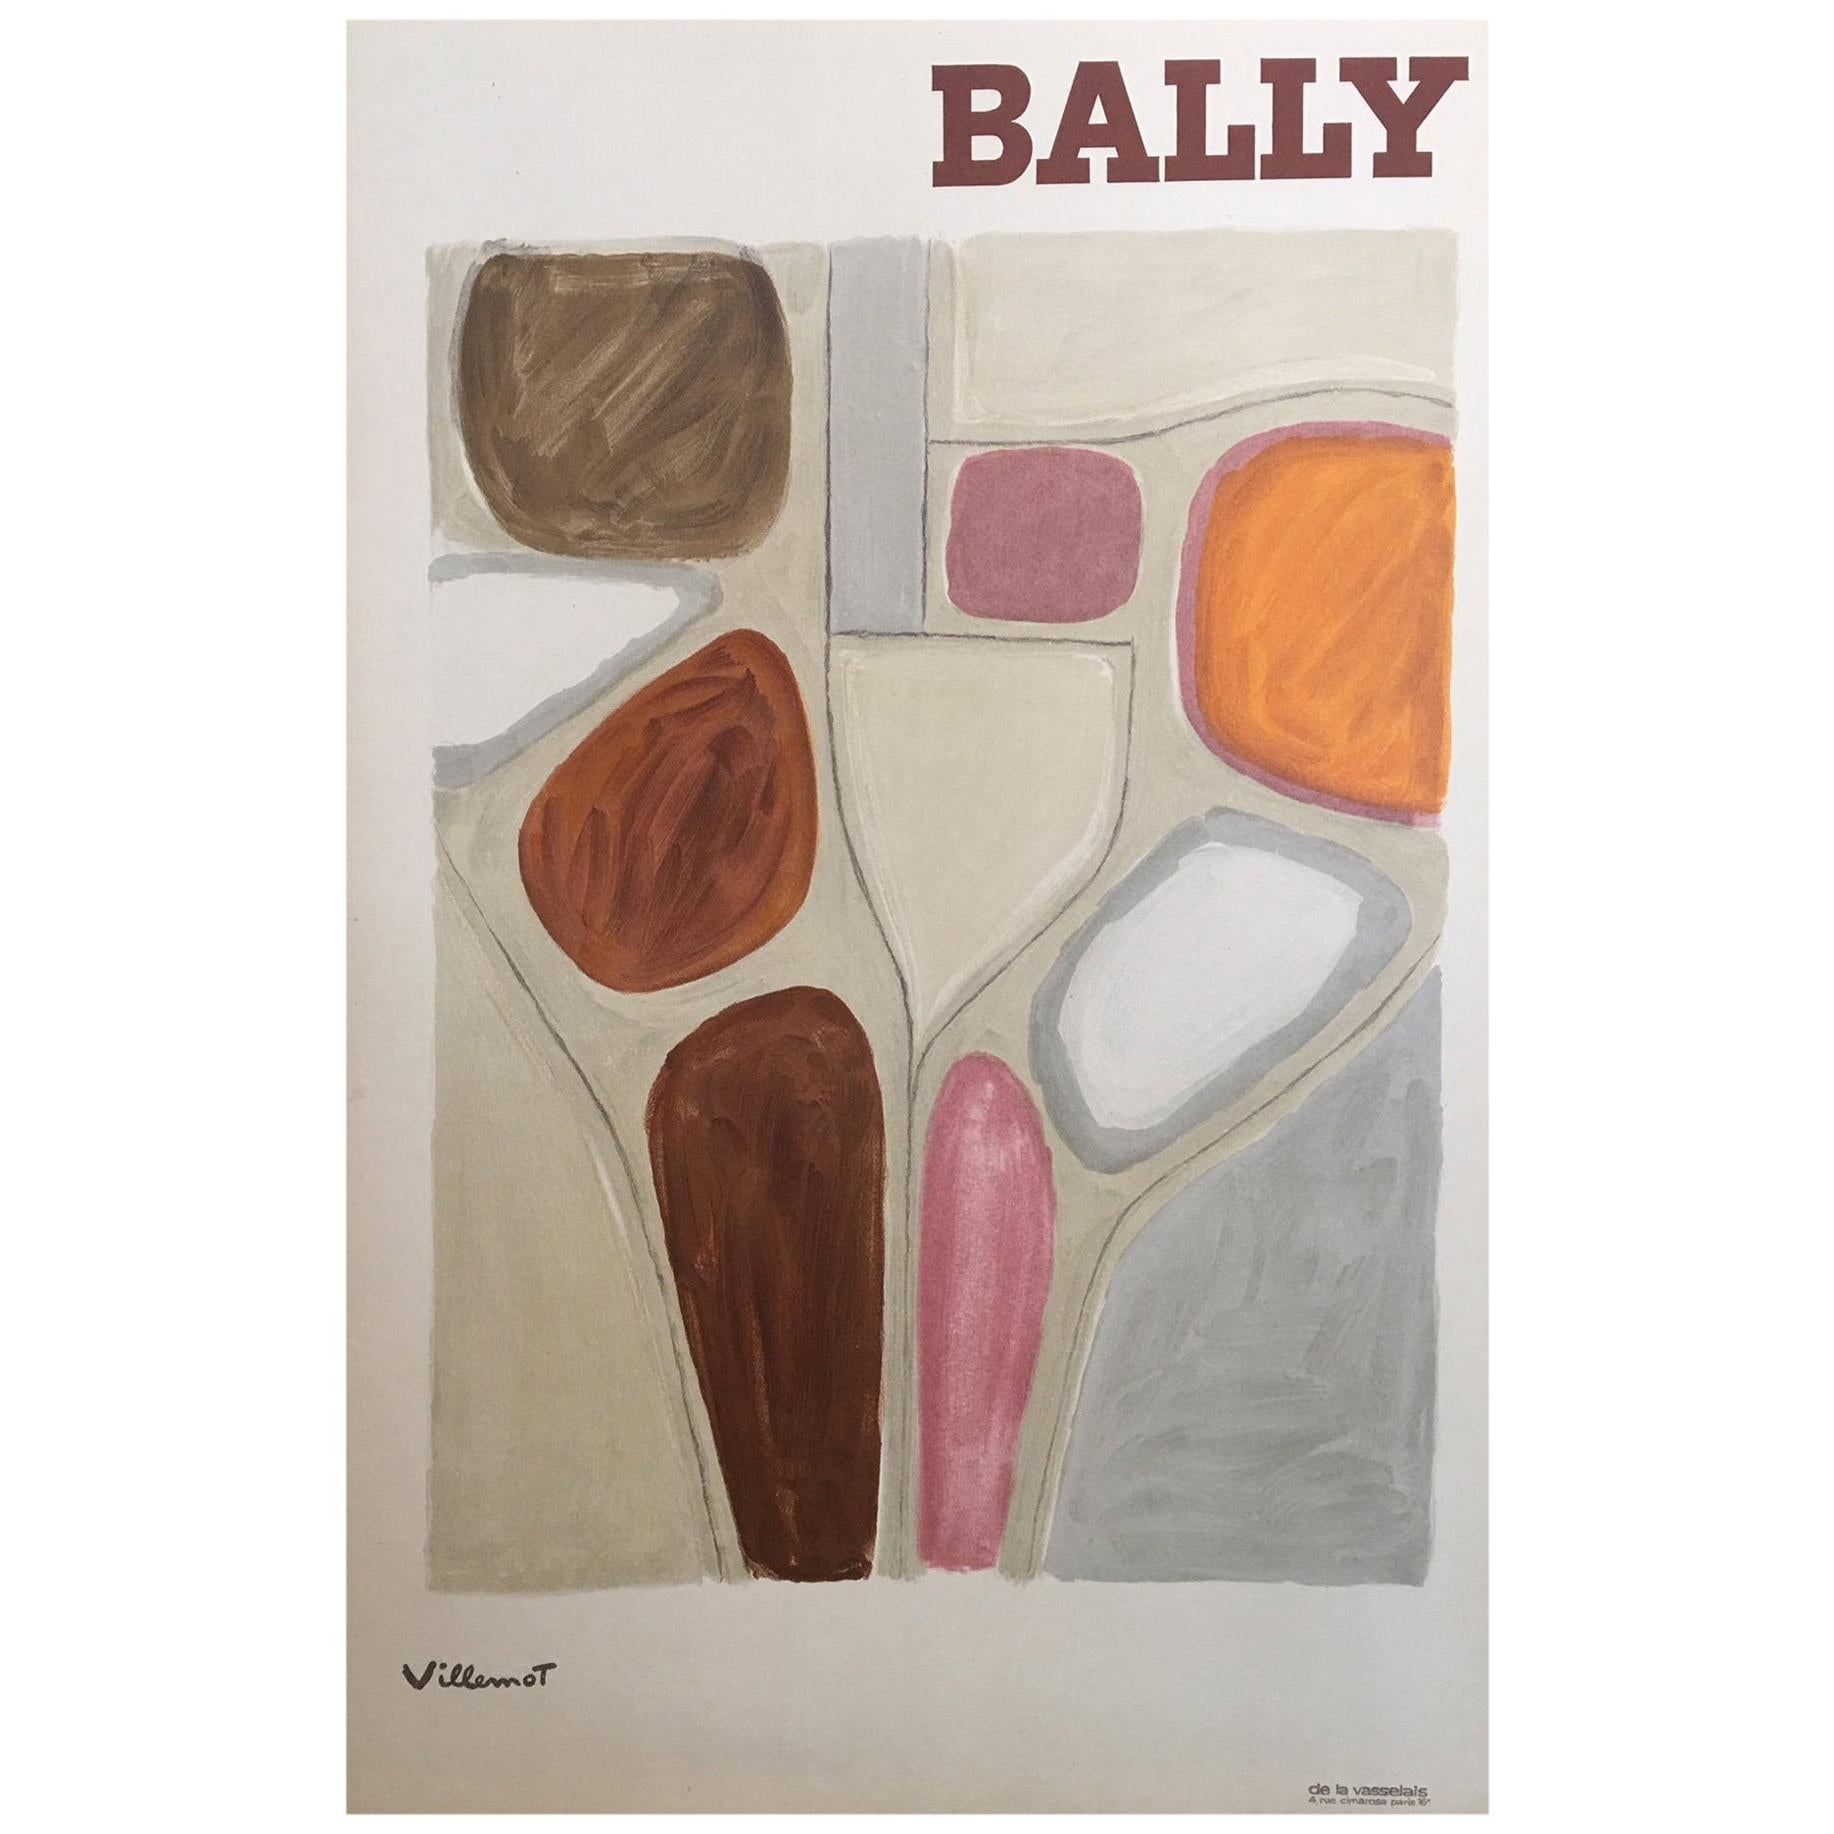 Original Vintage French Bally Abstract' Shoe Poster, by Bernard Villemot, 1971